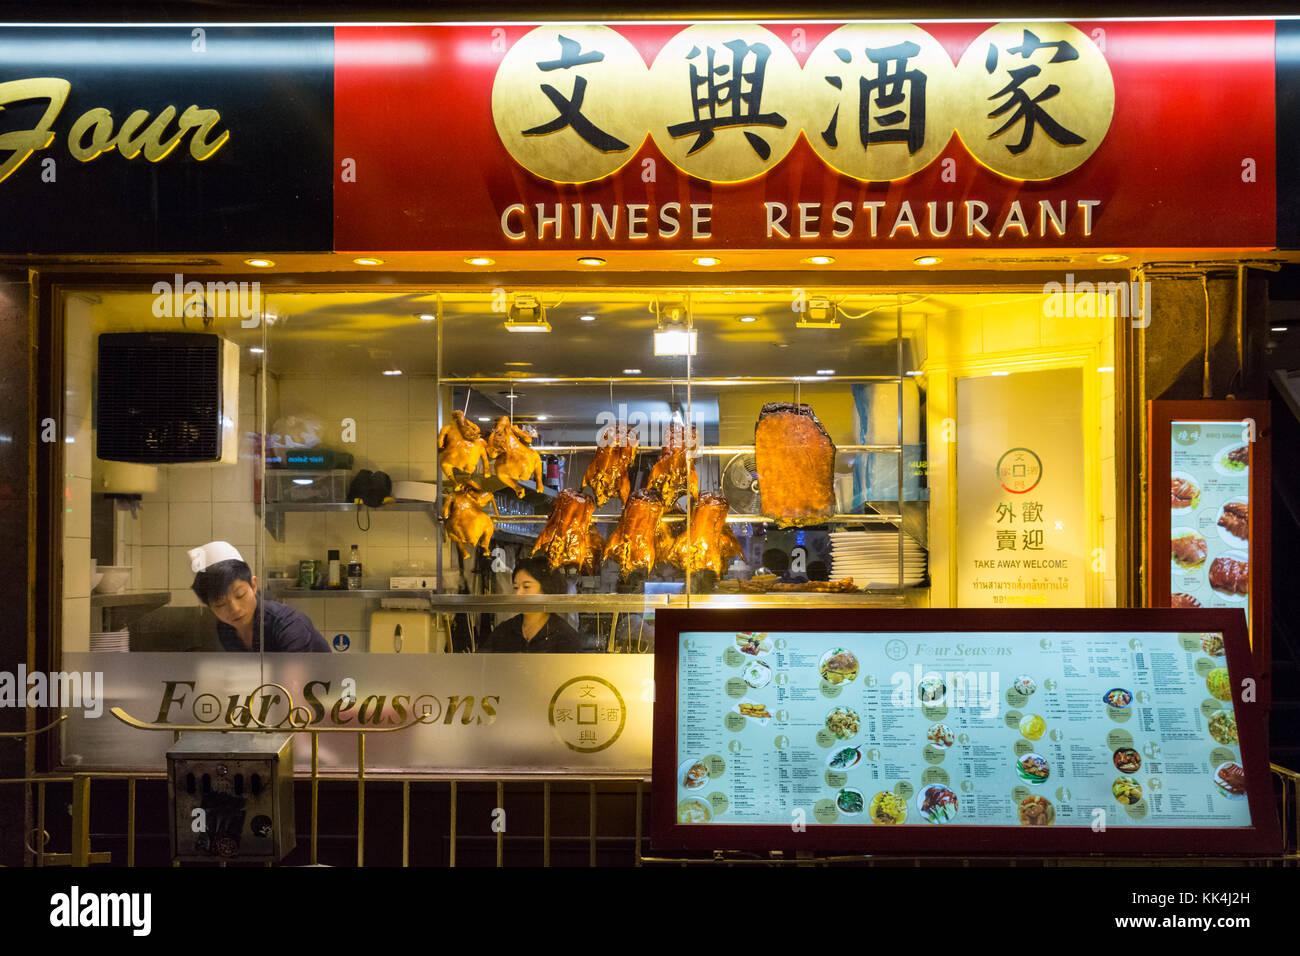 Crispy duck Chinese food display in Chinese restaurant window, Chinatown, London UK - Stock Image